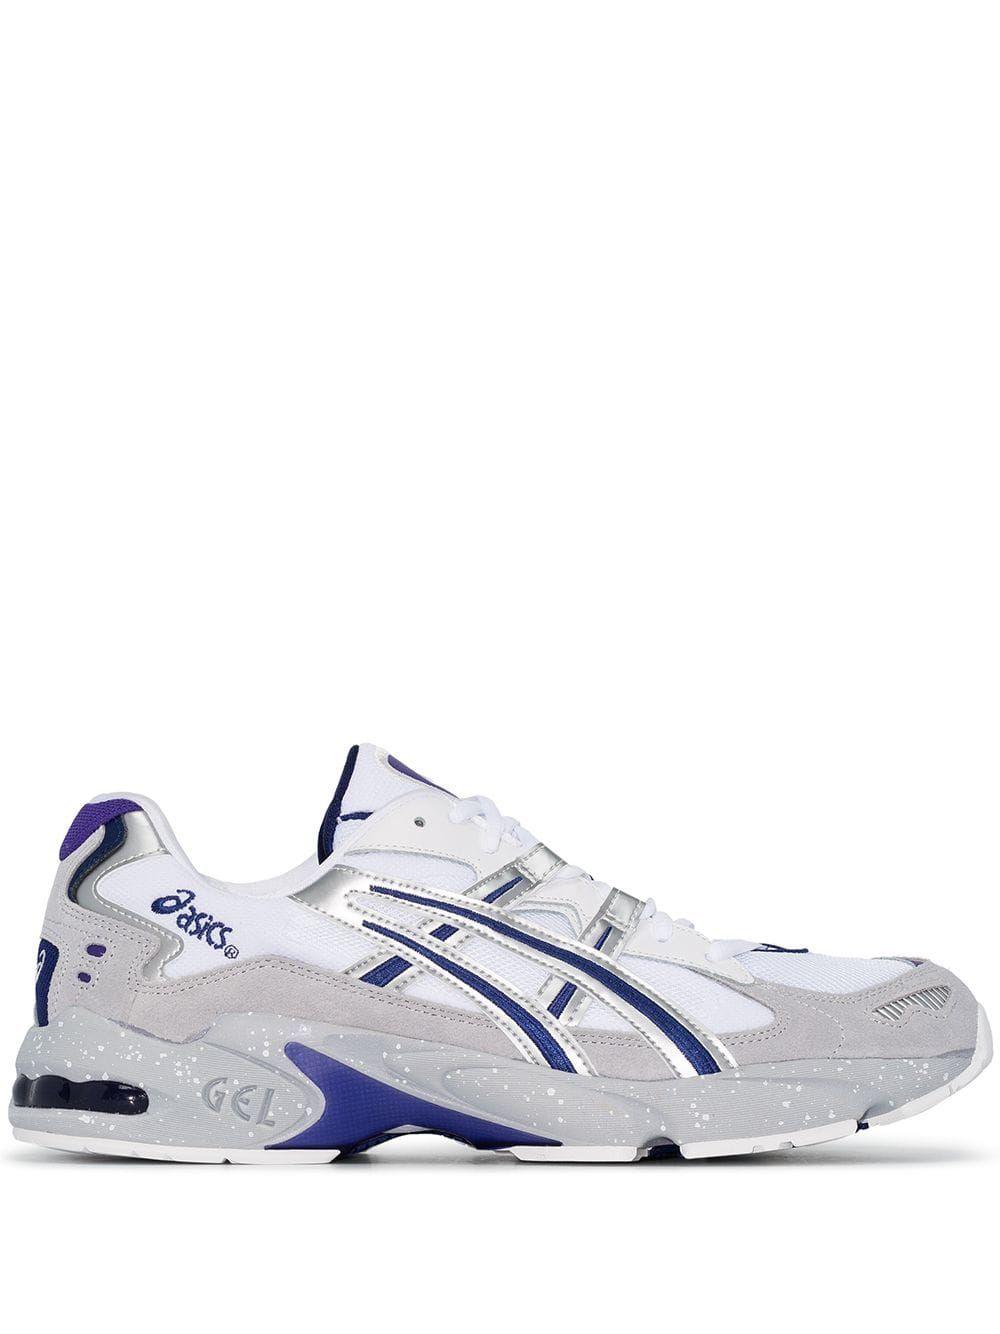 Asics Gel Kayano 5 Sneakers Multicolour Running Shoe Brands